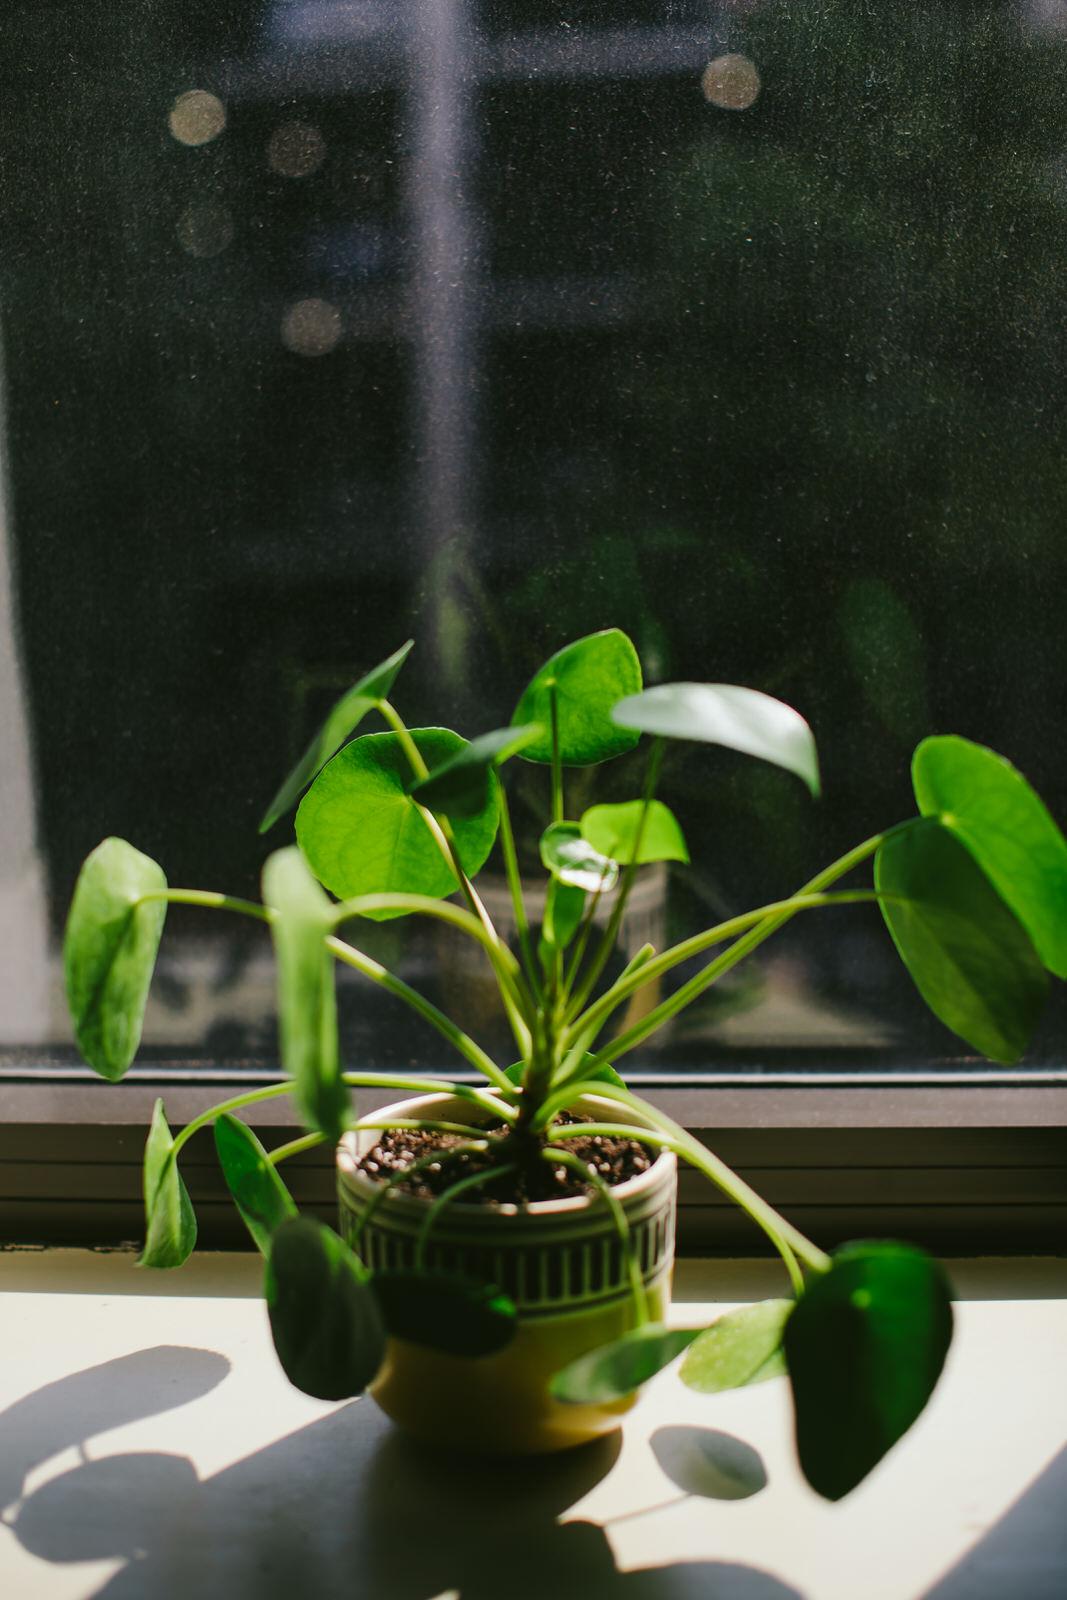 nashville-pilea-plant-nature-vacation-tiny-house-photo.jpg